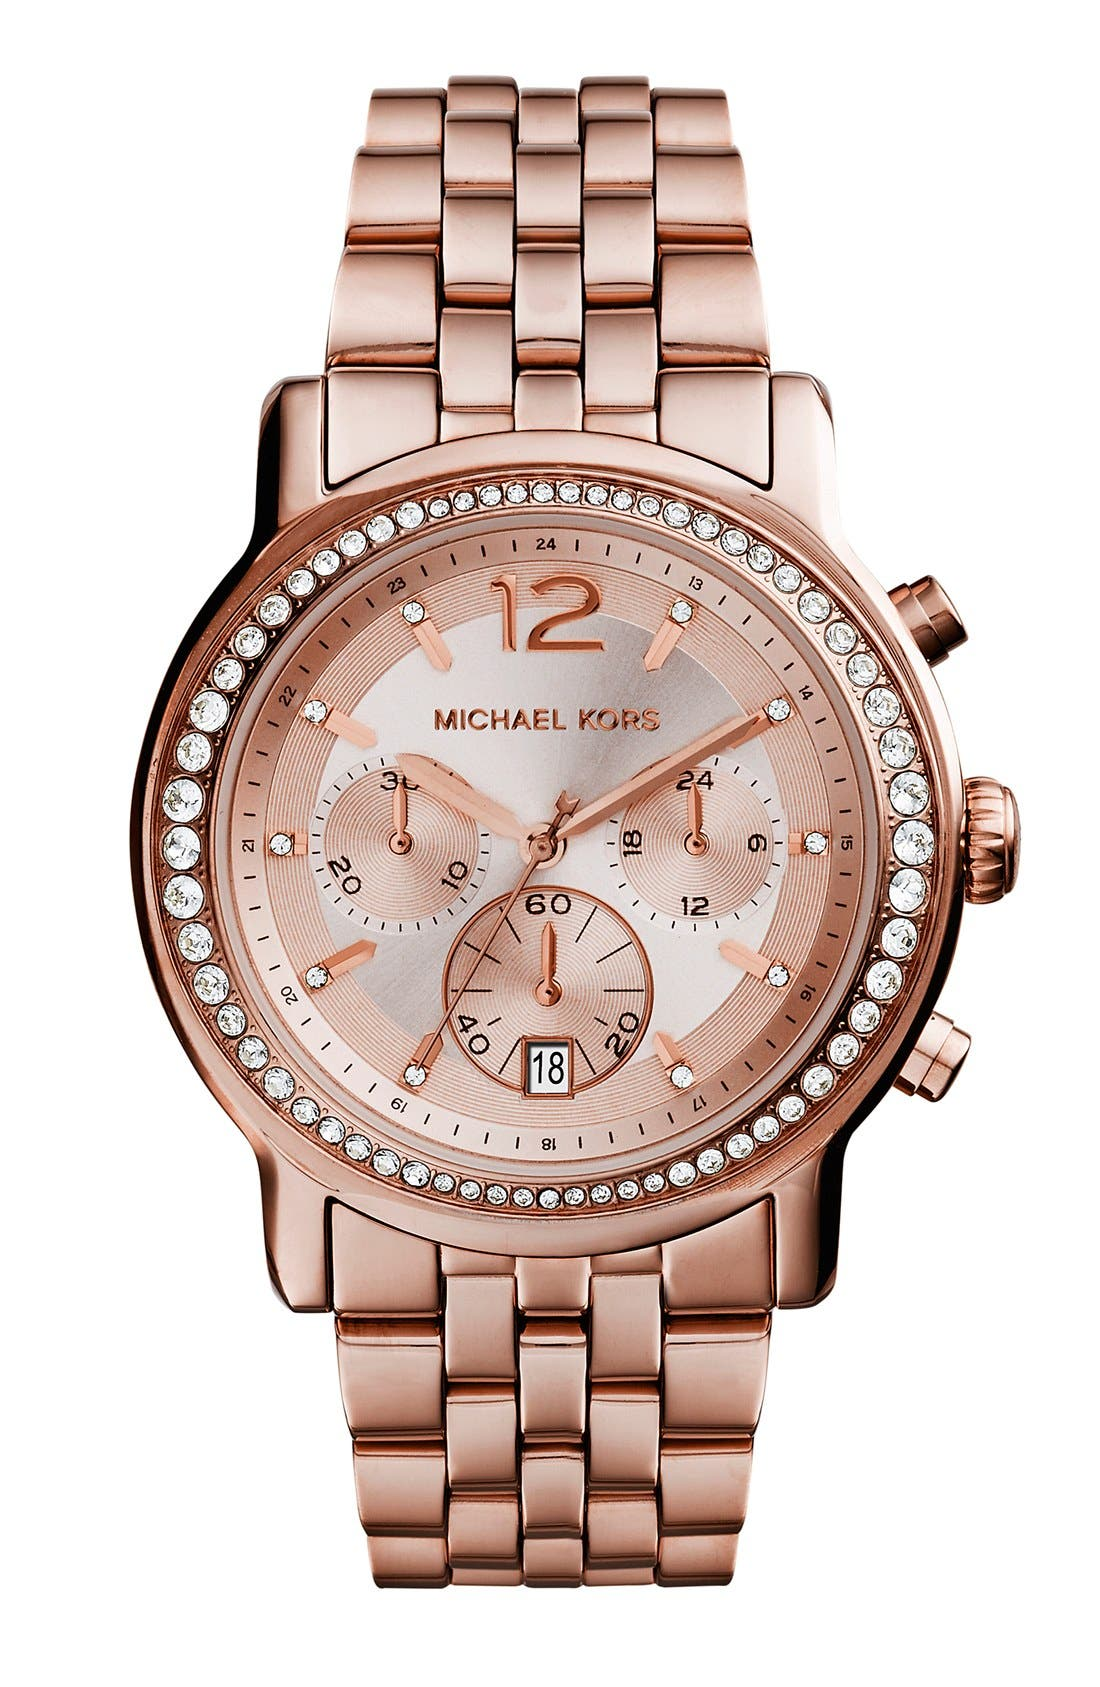 Alternate Image 1 Selected - Michael Kors 'Baisley' Crystal Bezel Chronograph Bracelet Watch, 41mm (Nordstrom Exclusive)